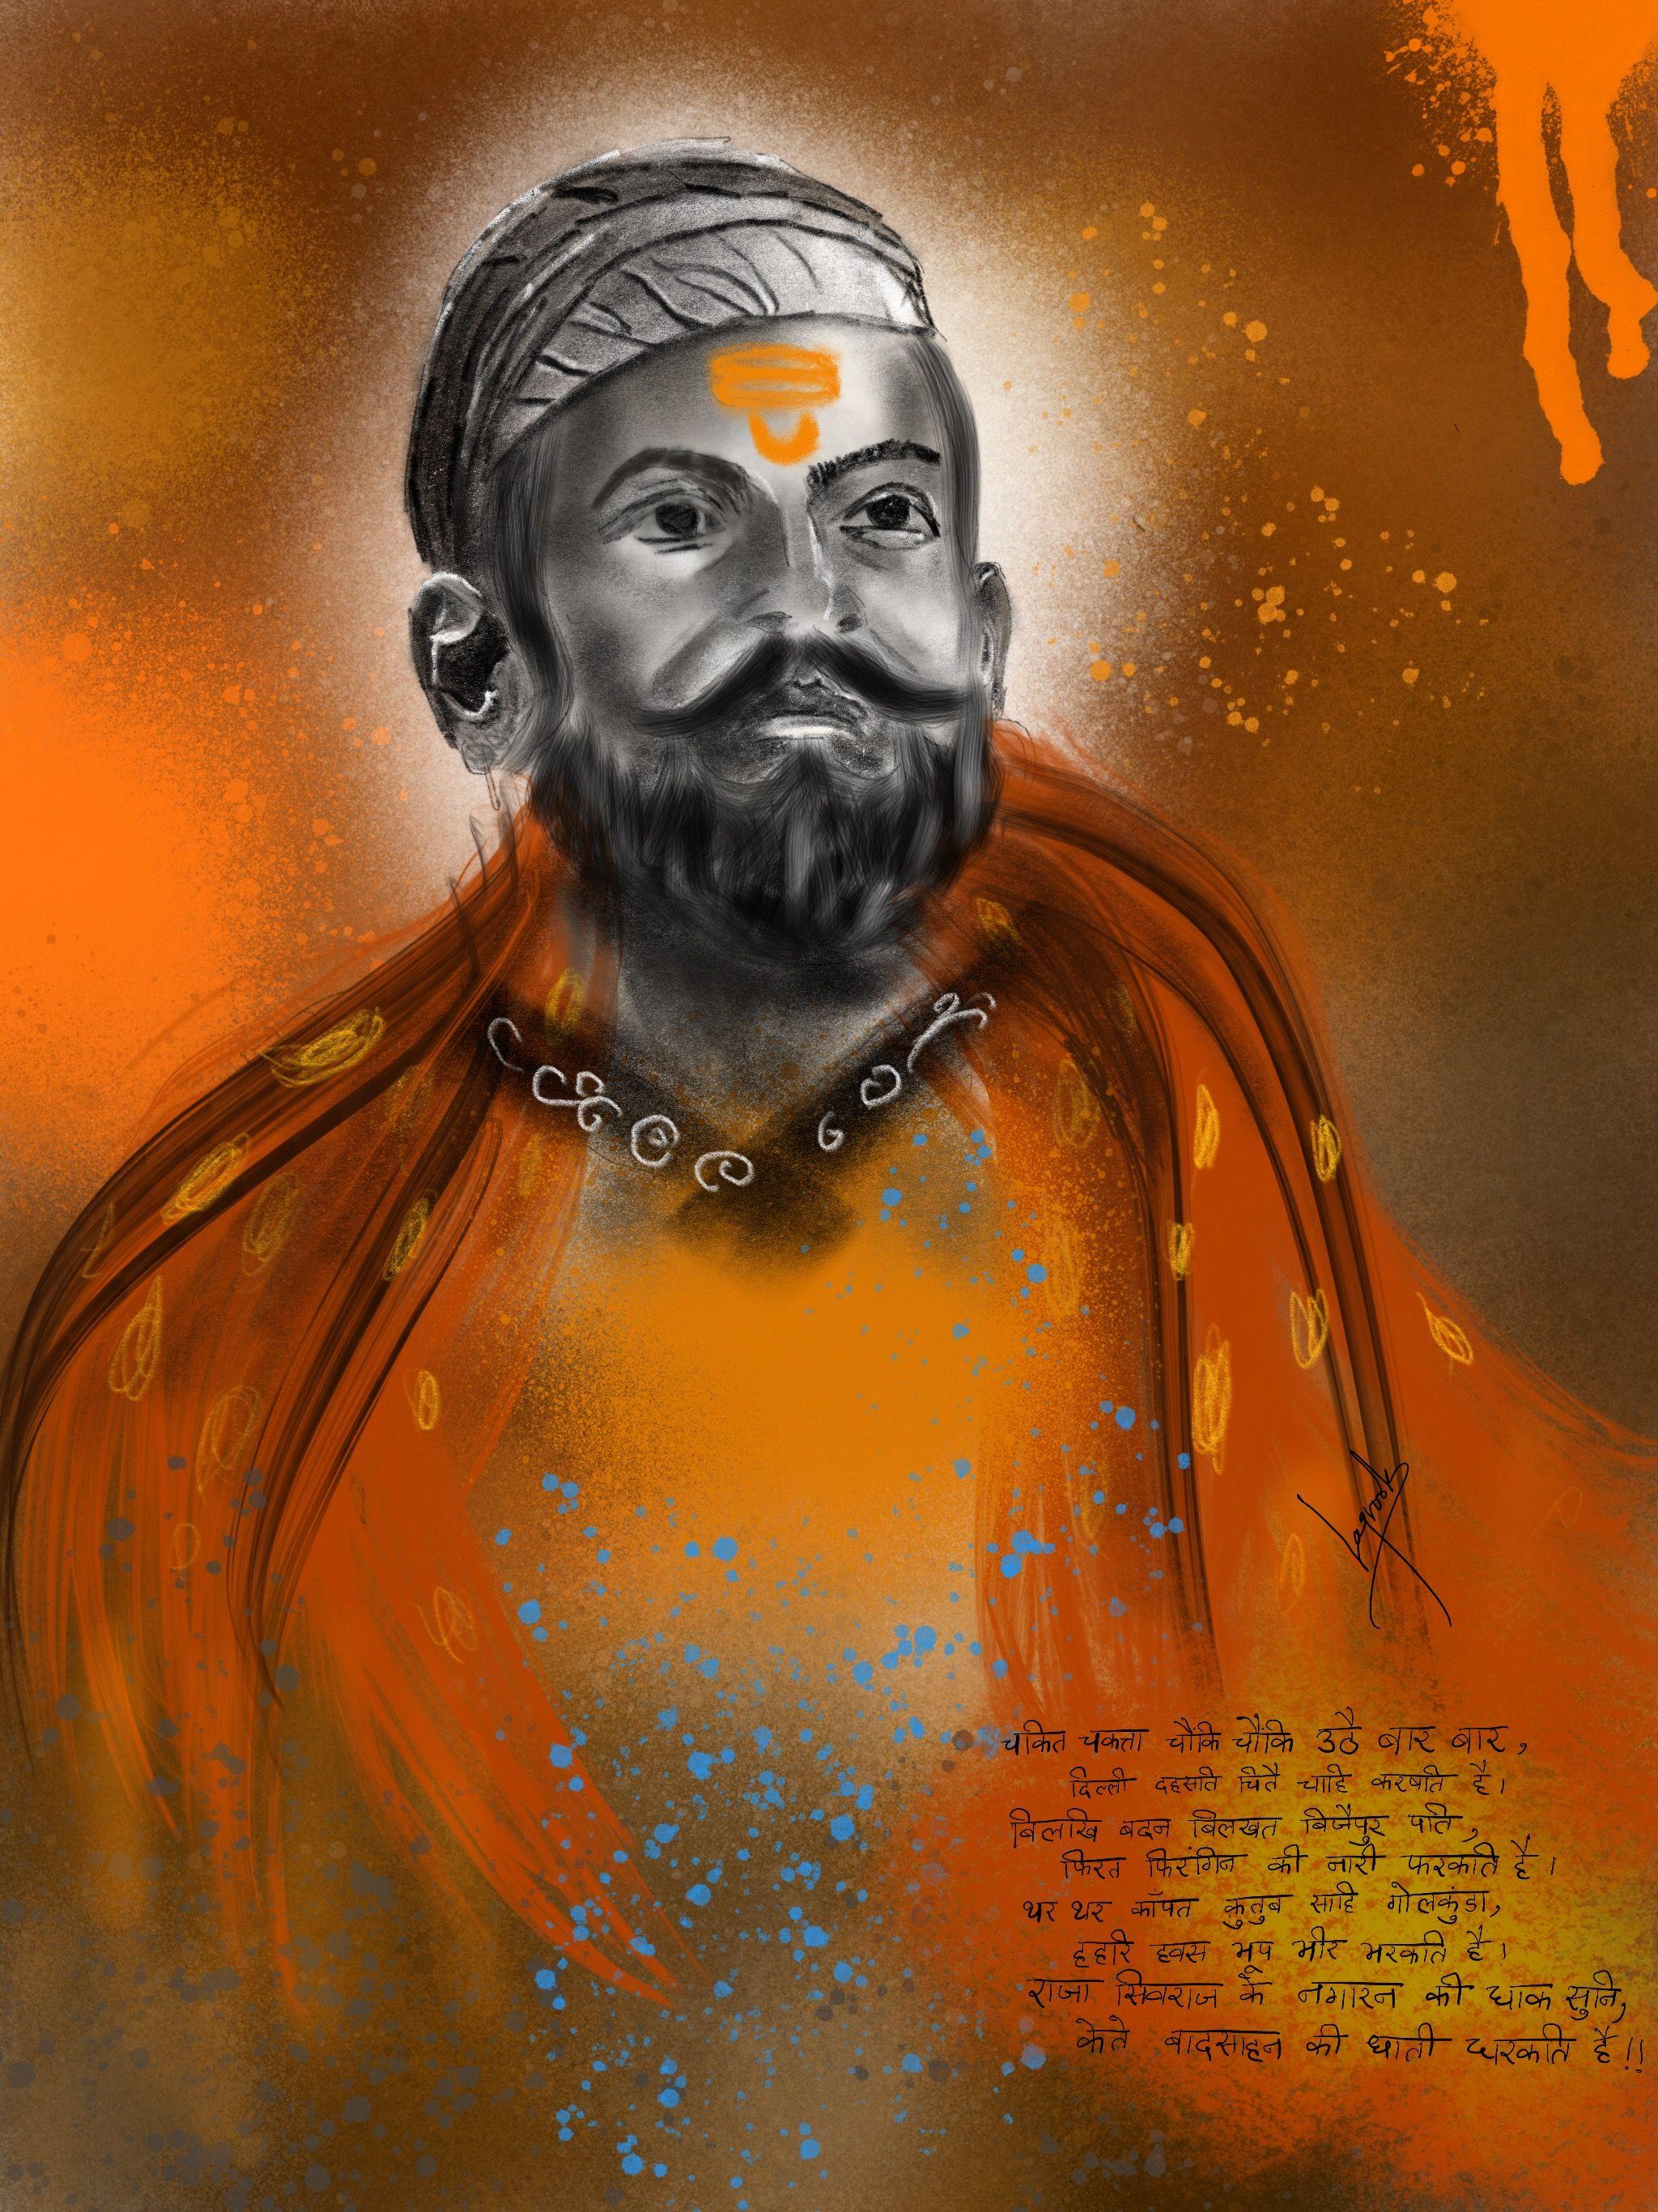 Chatrapati Shivaji Lord Shiva Hd Images, Krishna Images, - Picsart Shivaji Maharaj Background Hd , HD Wallpaper & Backgrounds